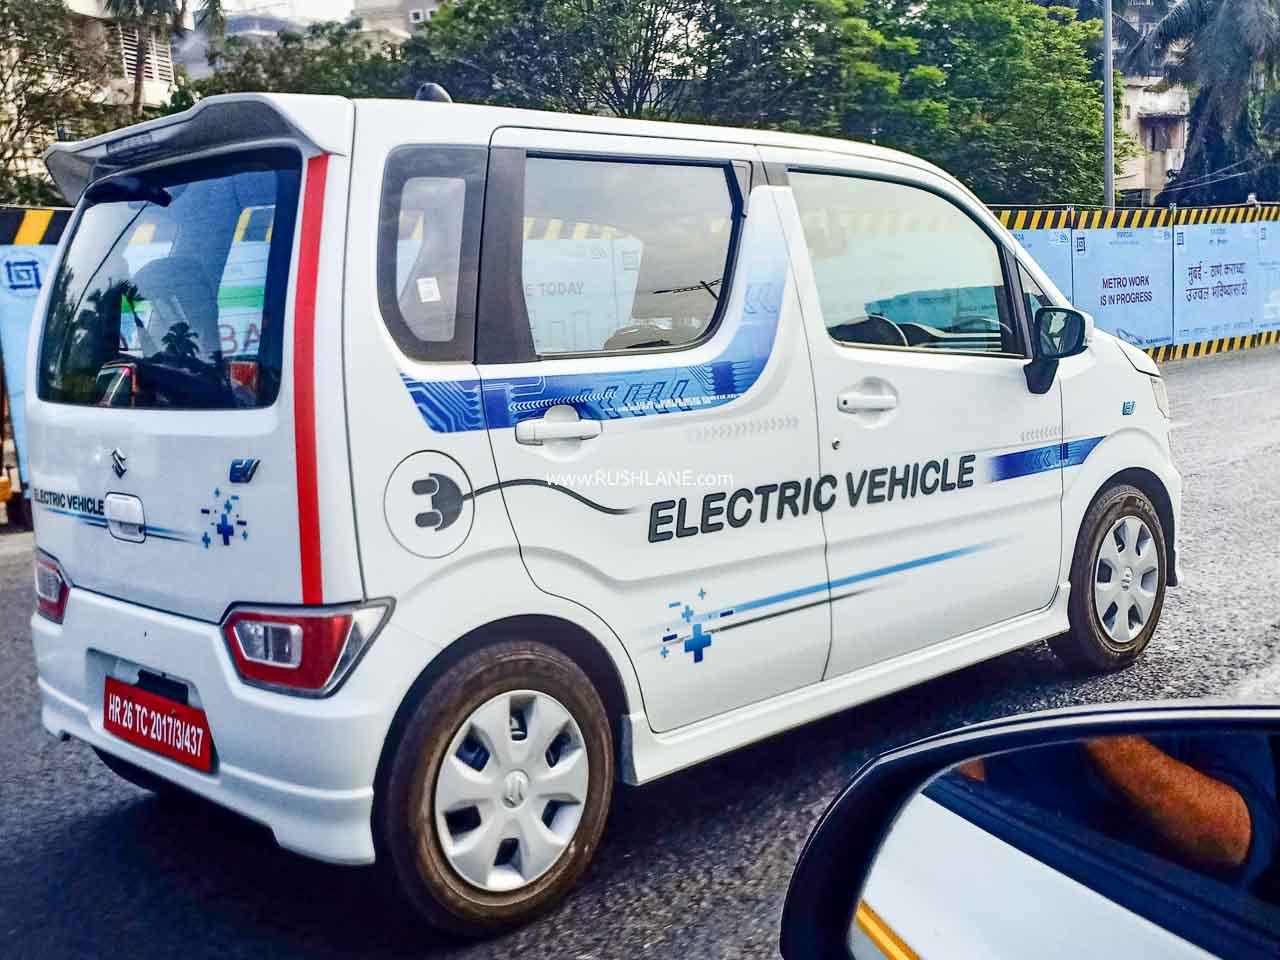 15 Upcoming Electric Car Launches – Maruti WagonR to Tata Altroz